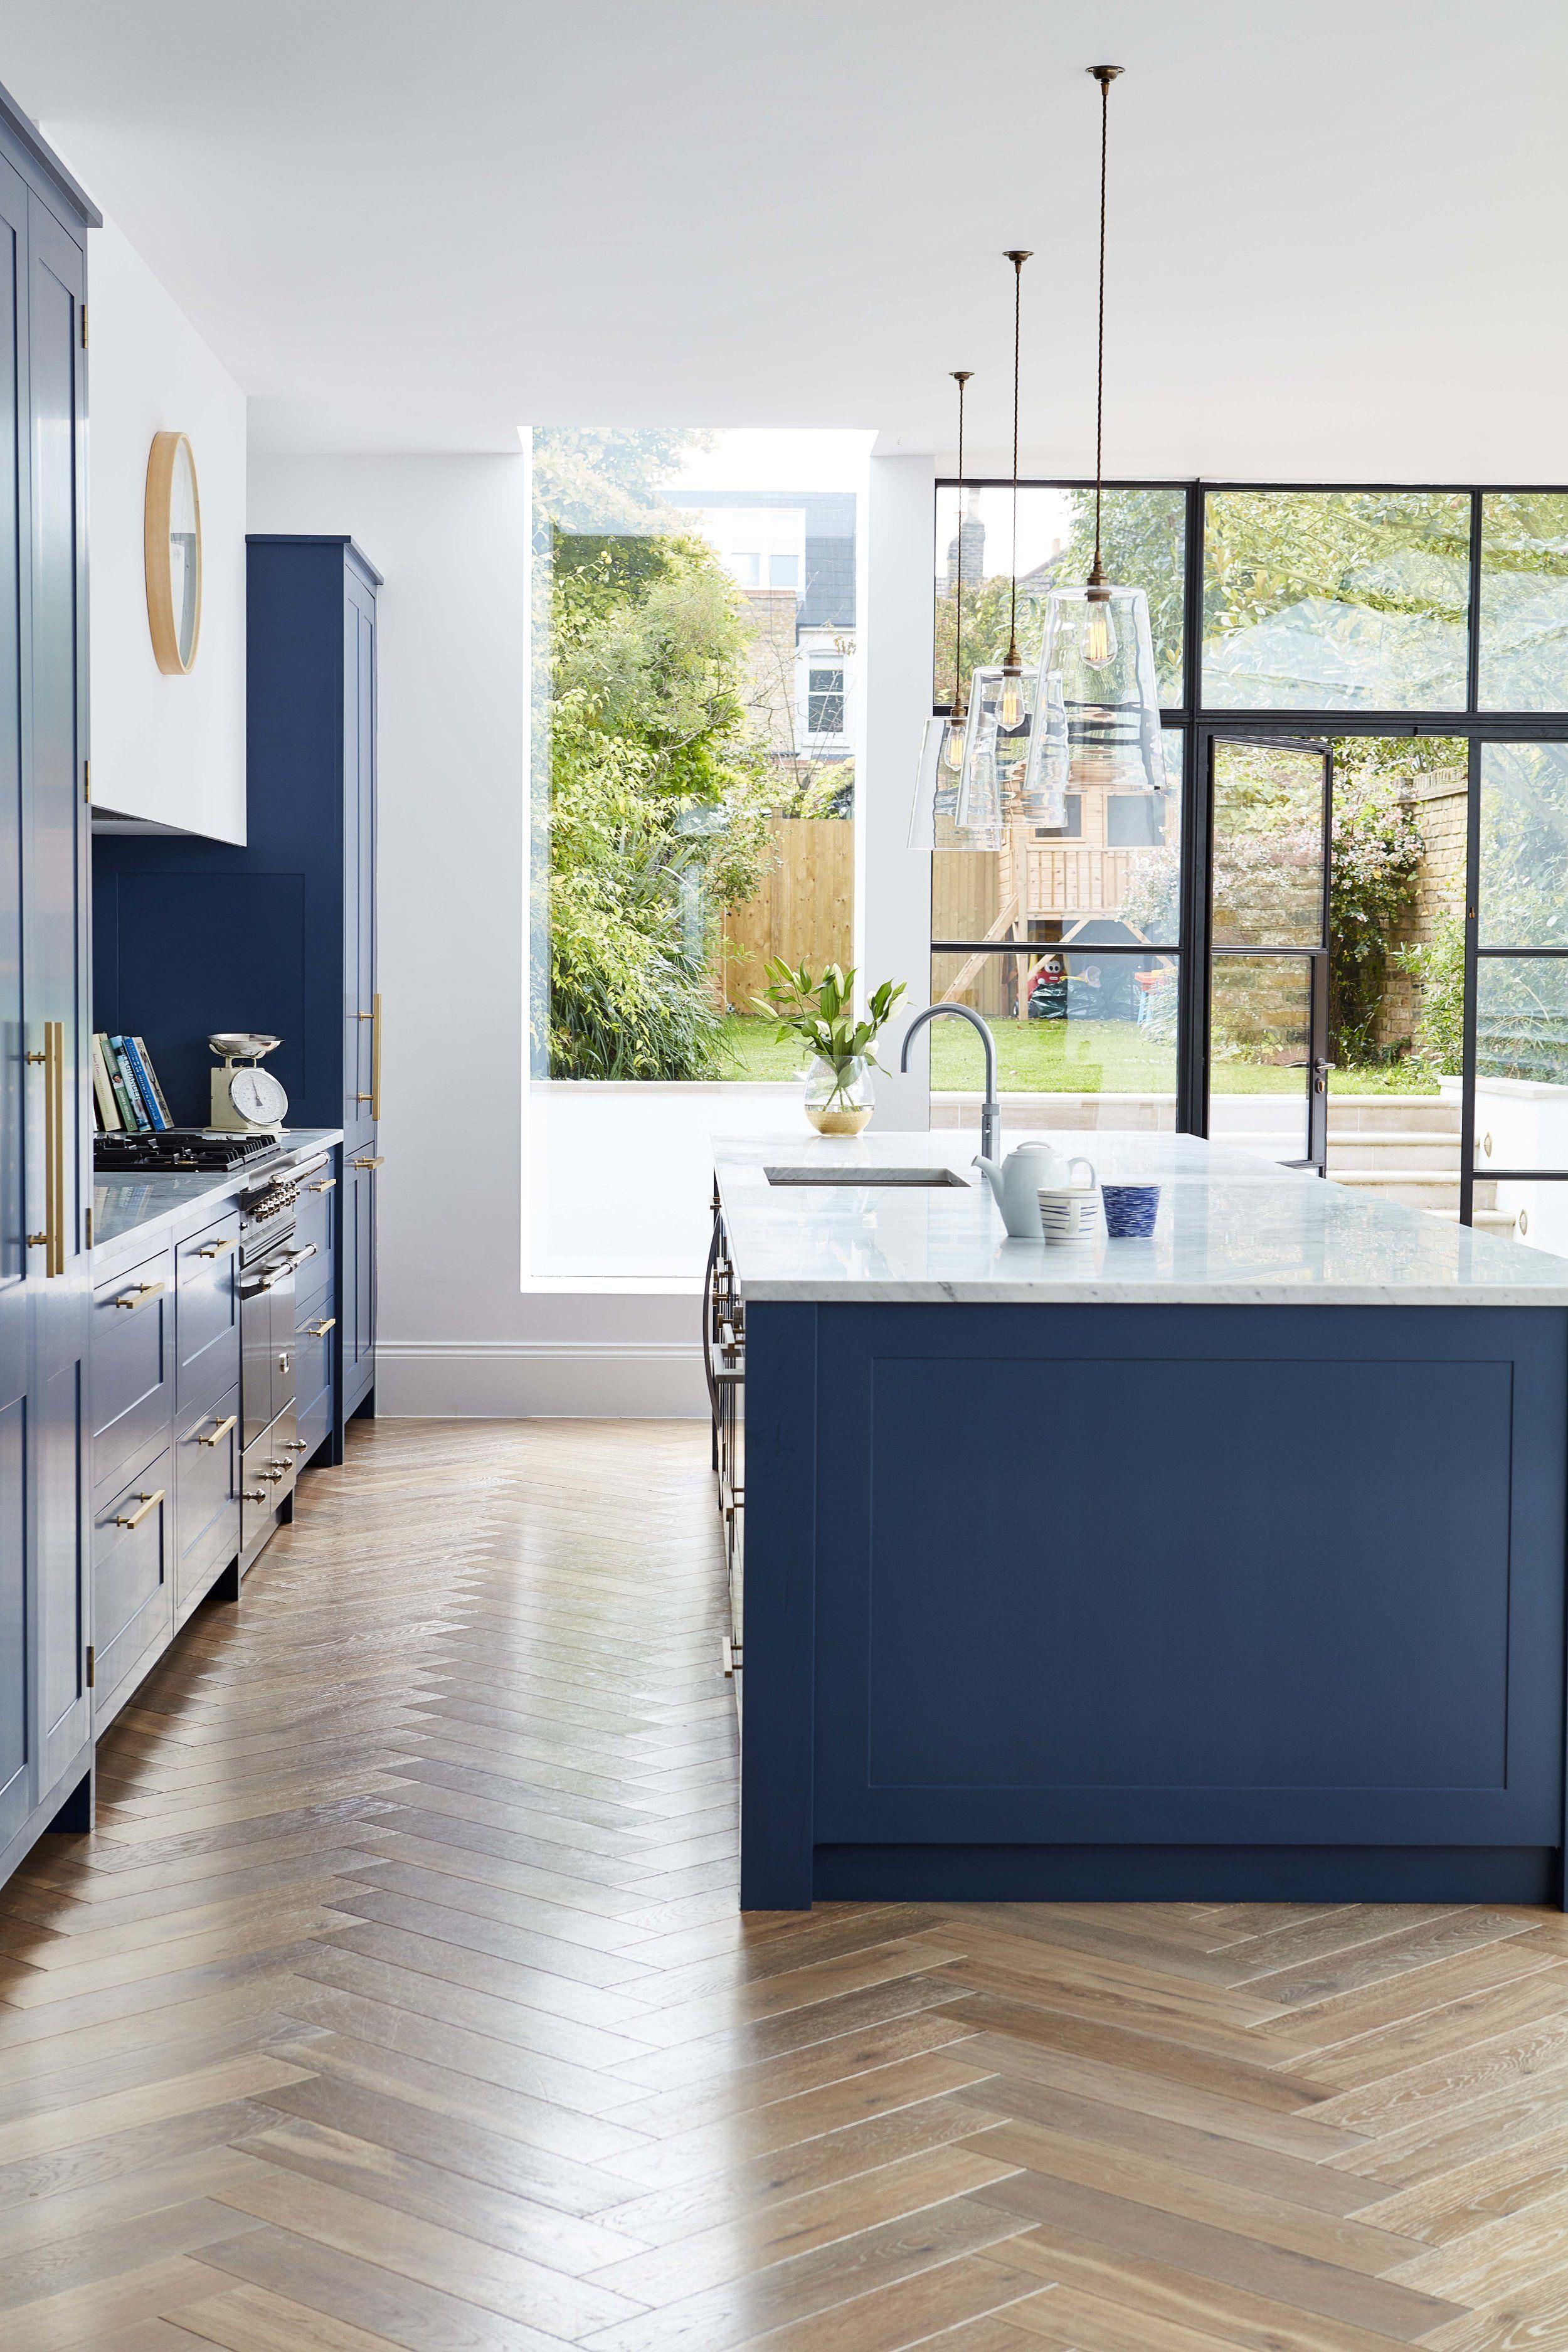 Best A Deep Blue Kitchen In An Open Plan Kitchen Design With A 400 x 300